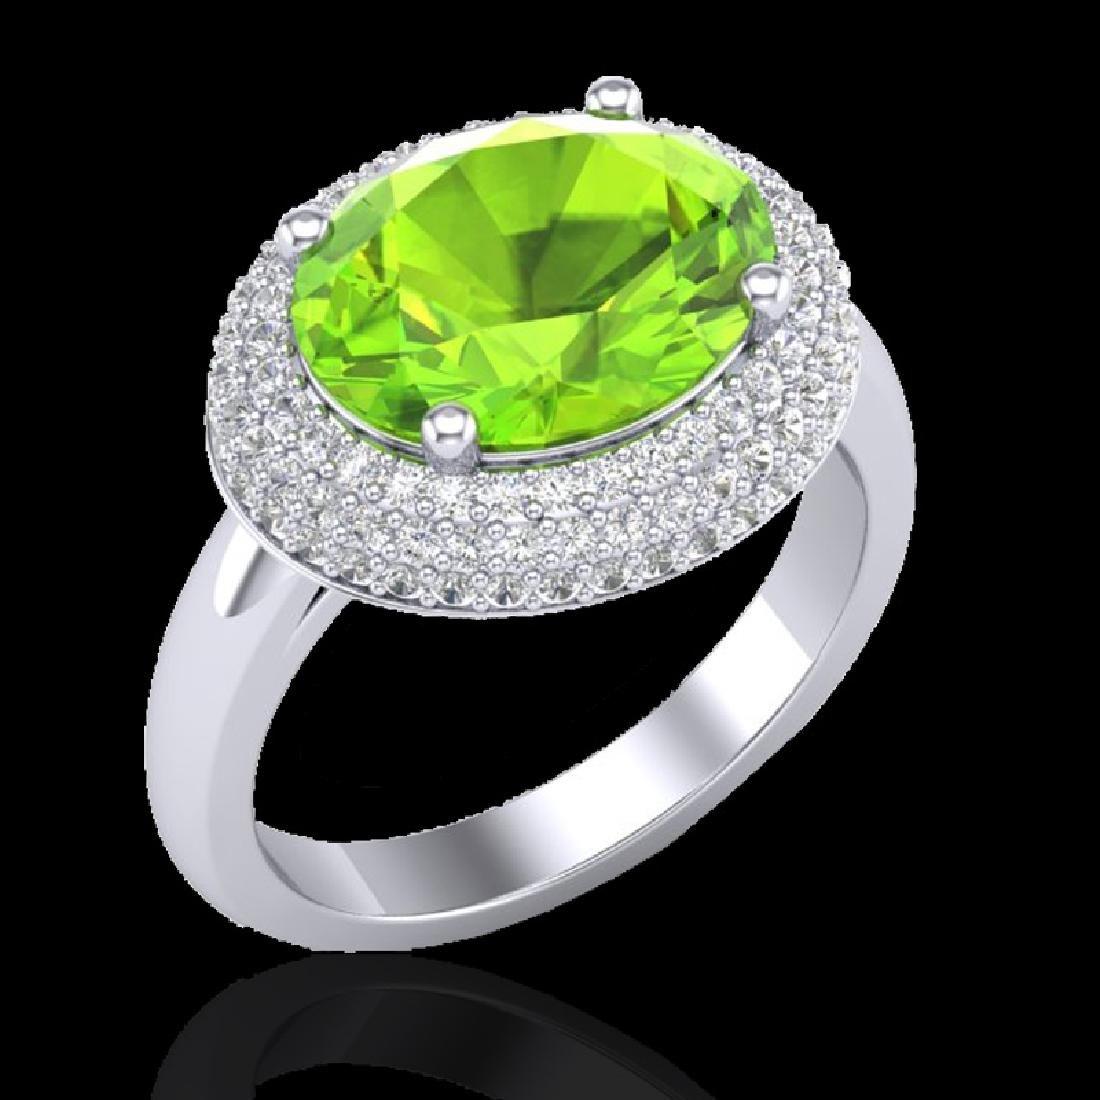 4.50 CTW Peridot & Micro Pave VS/SI Diamond Ring 18K